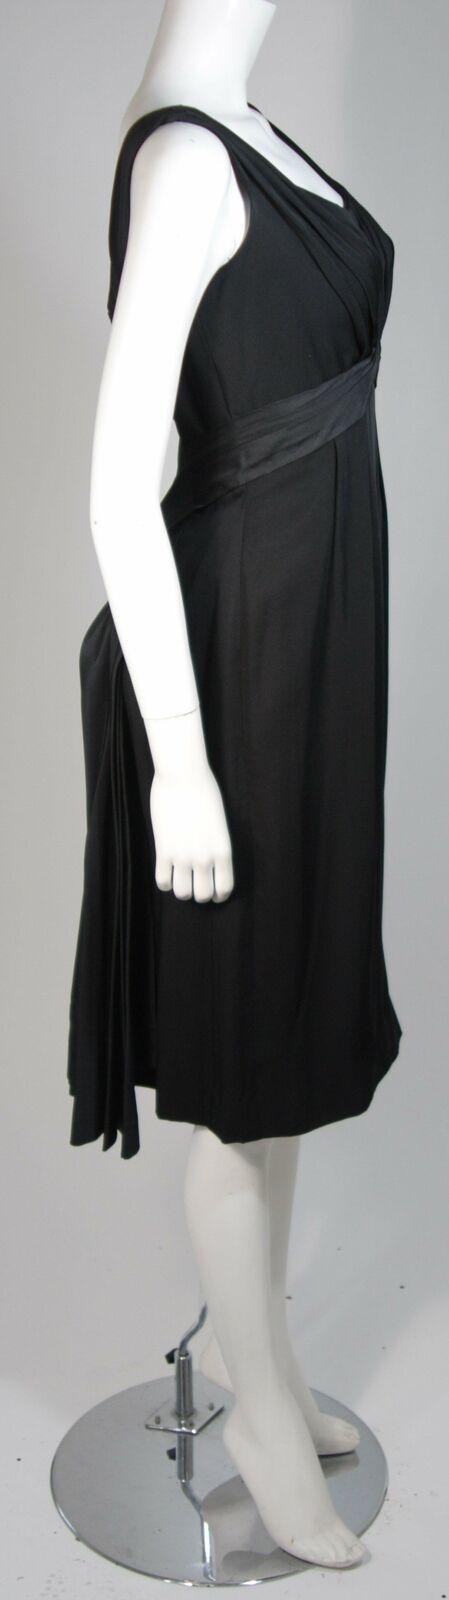 CEIL CHAPMAN 1950s Black Draped Cocktail Dress Si… - image 5